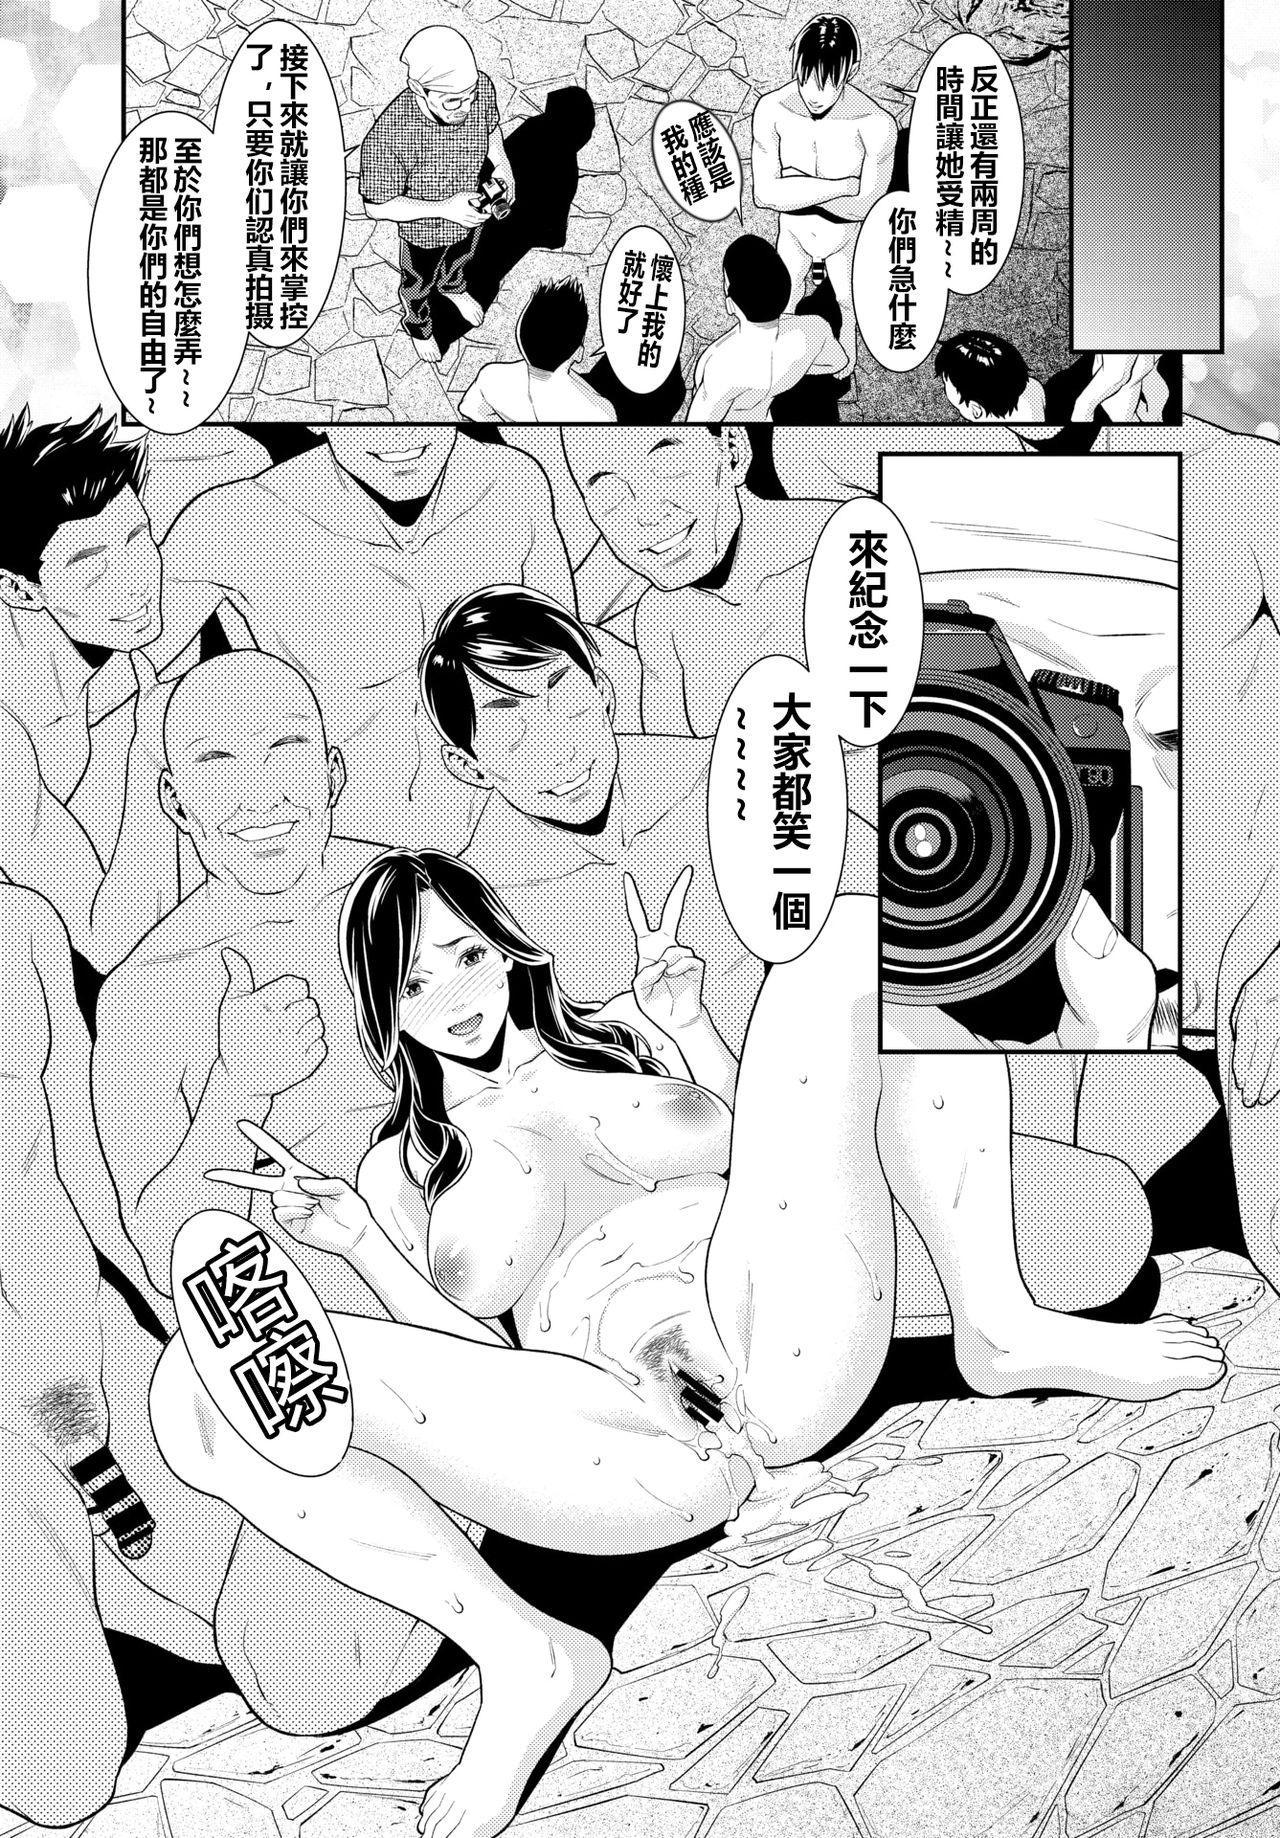 [Syuuen] Secret Wife  1-6 [Chinese][鼠灣漢化](210206最新修复完整版)【極品人妻NTR】 113